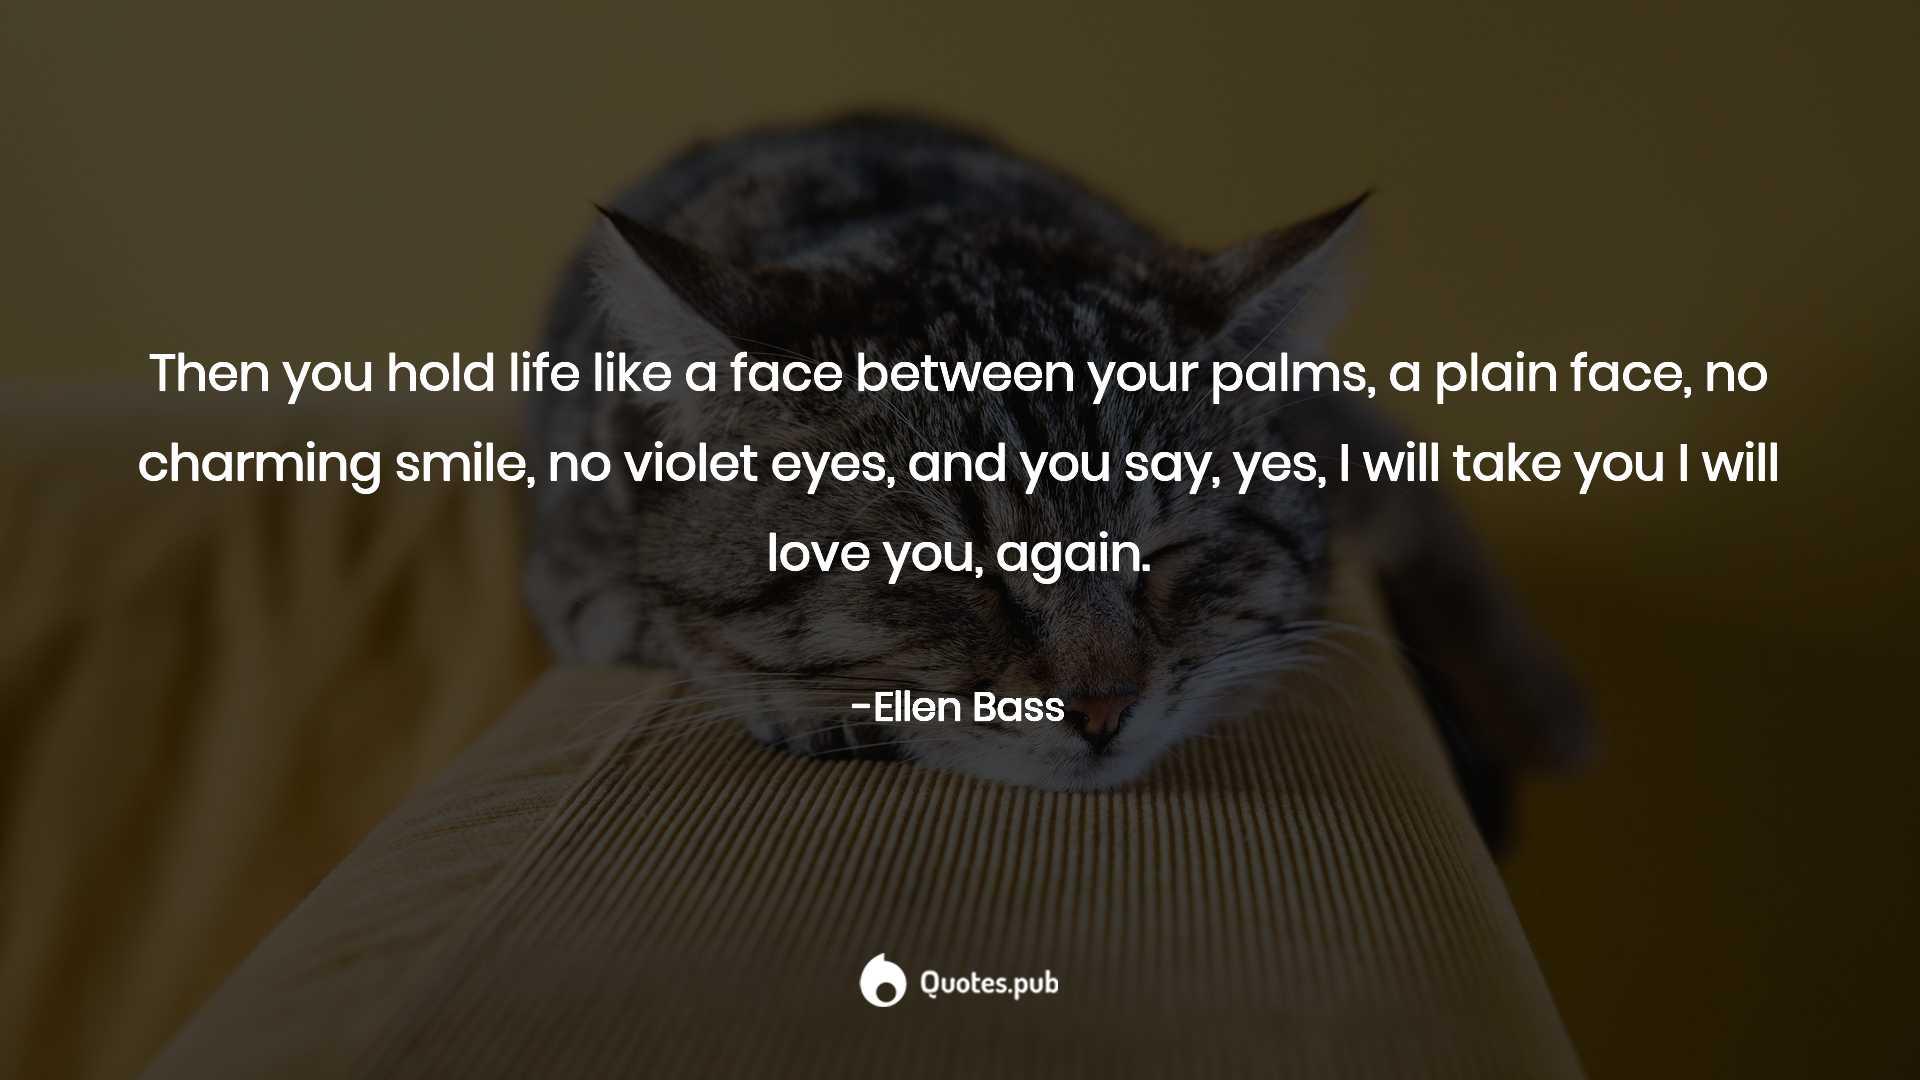 Then You Hold Life Like A Facebetween You Ellen Bass Quotespub